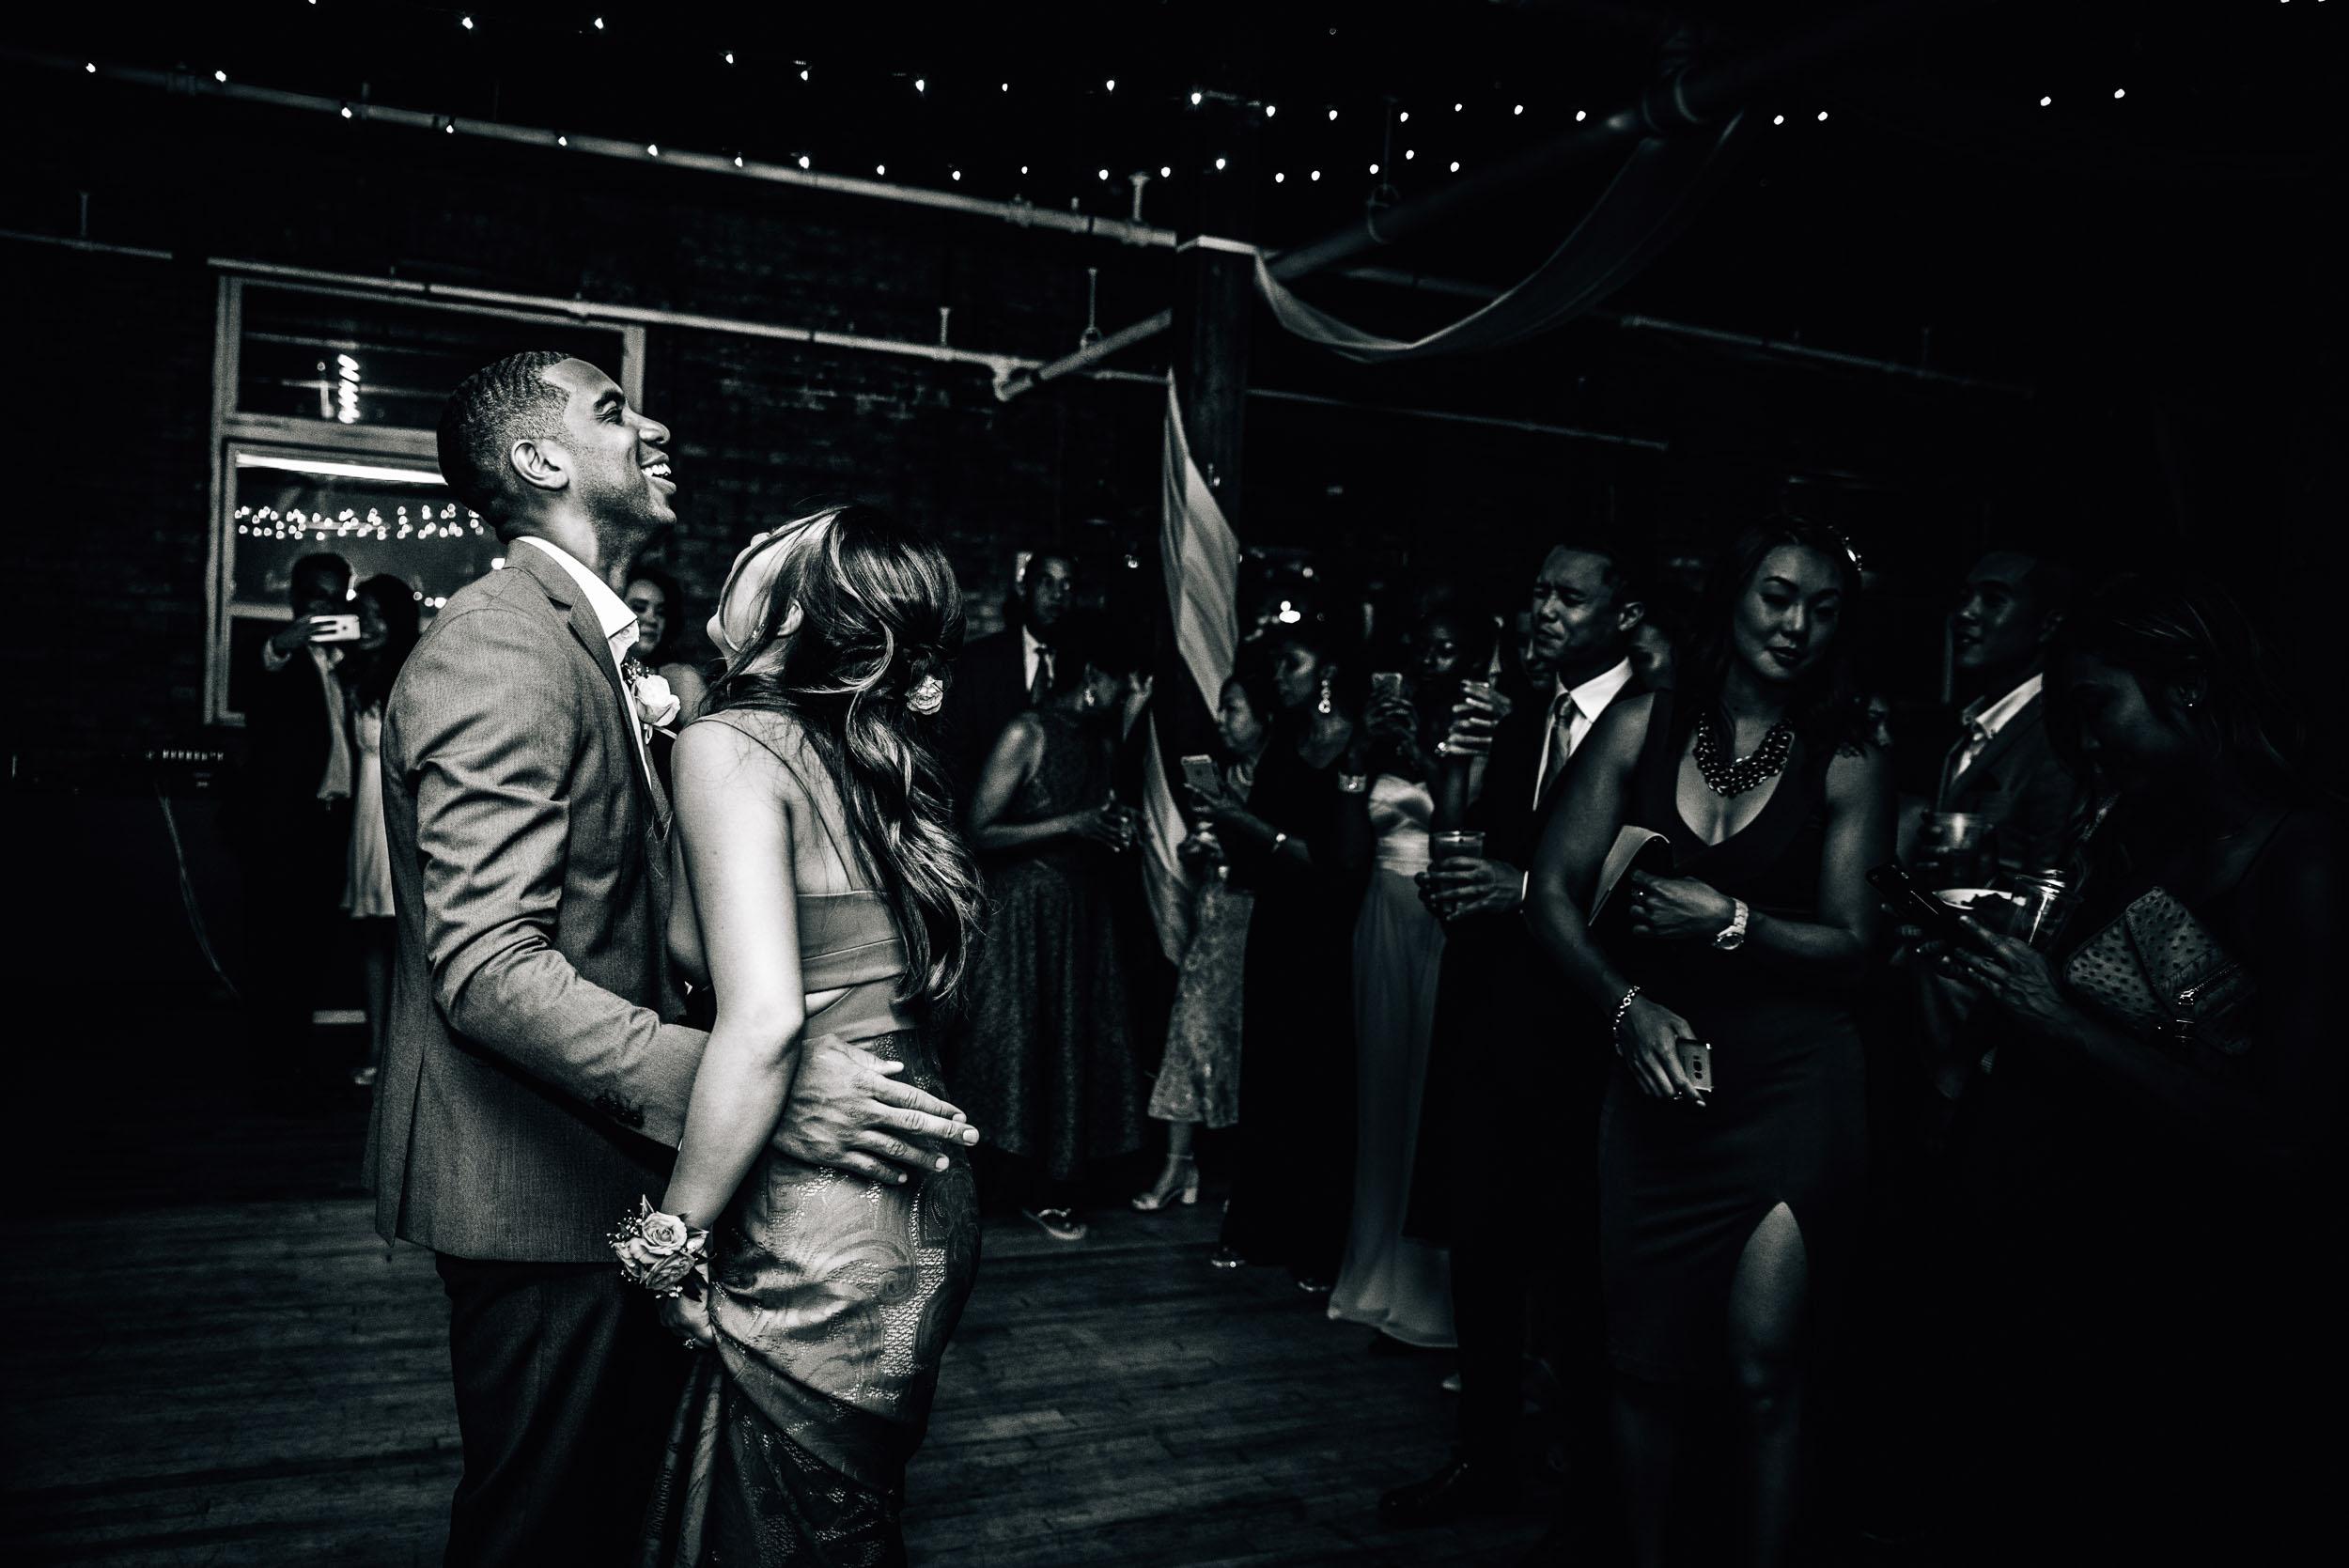 toronto-london-ontario-wedding-photographer-20.jpg